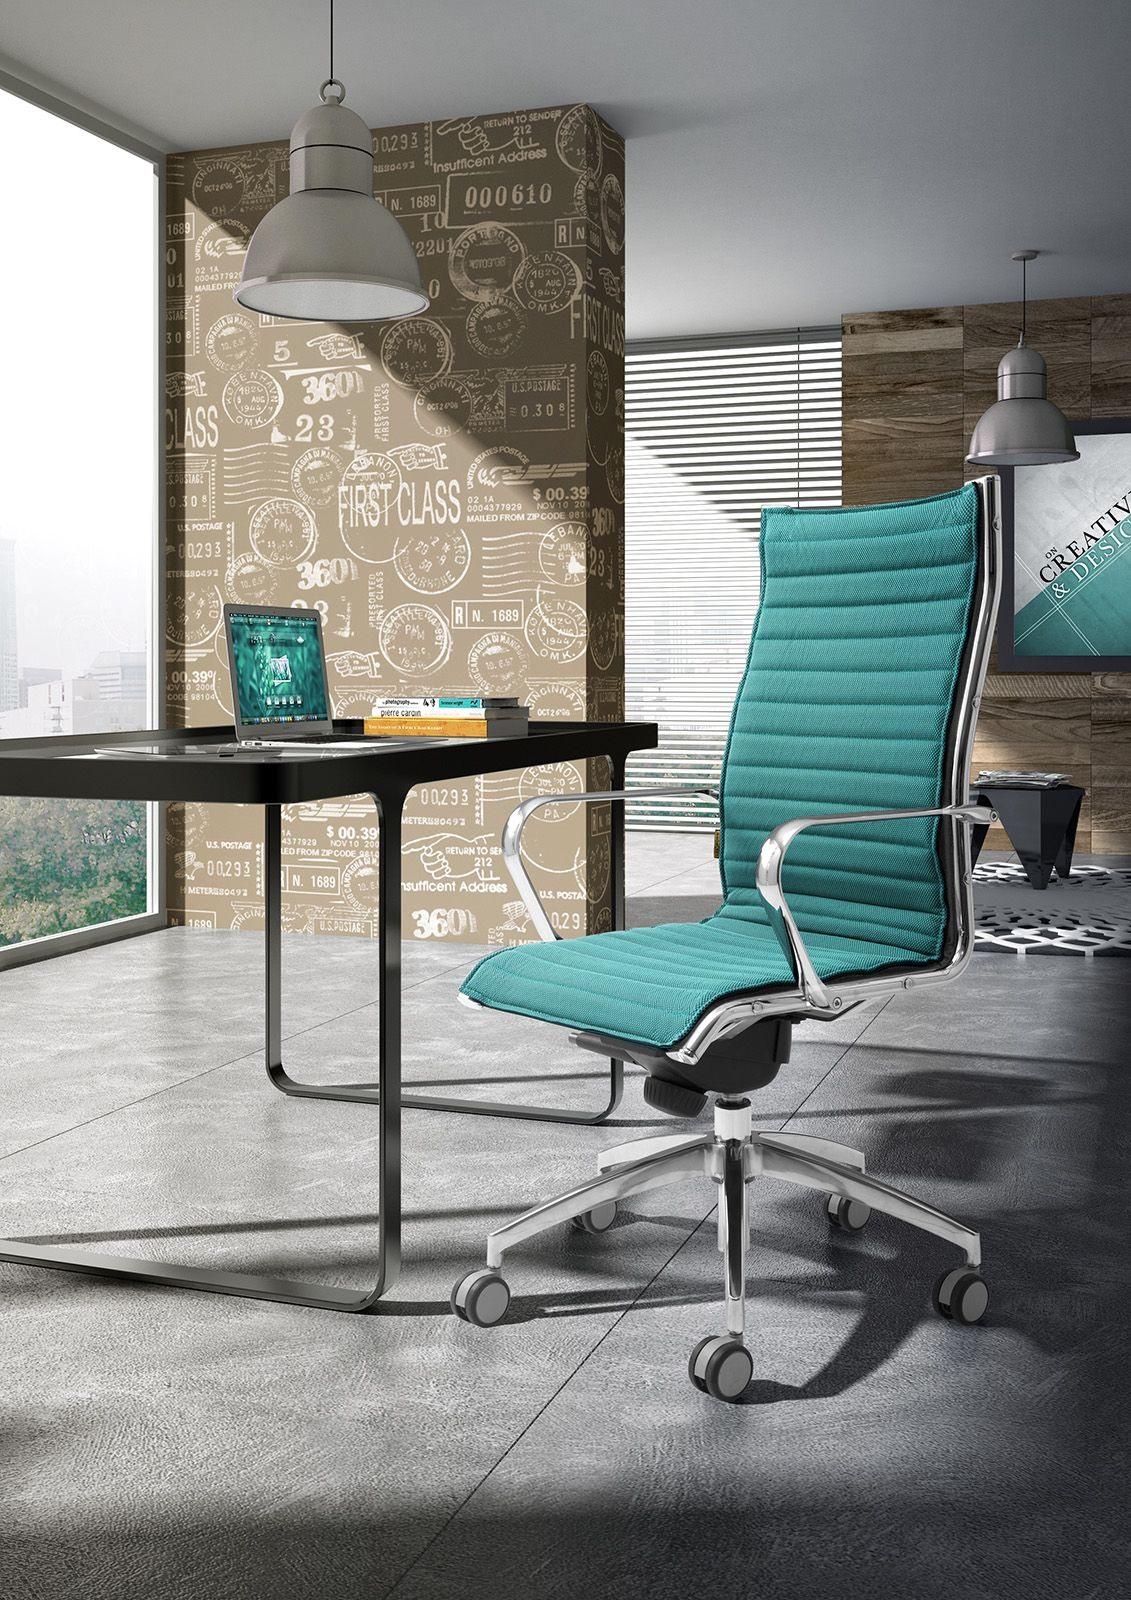 Origami IN high executive 70110M, Presidential chaise de bureau, aluminium chromé